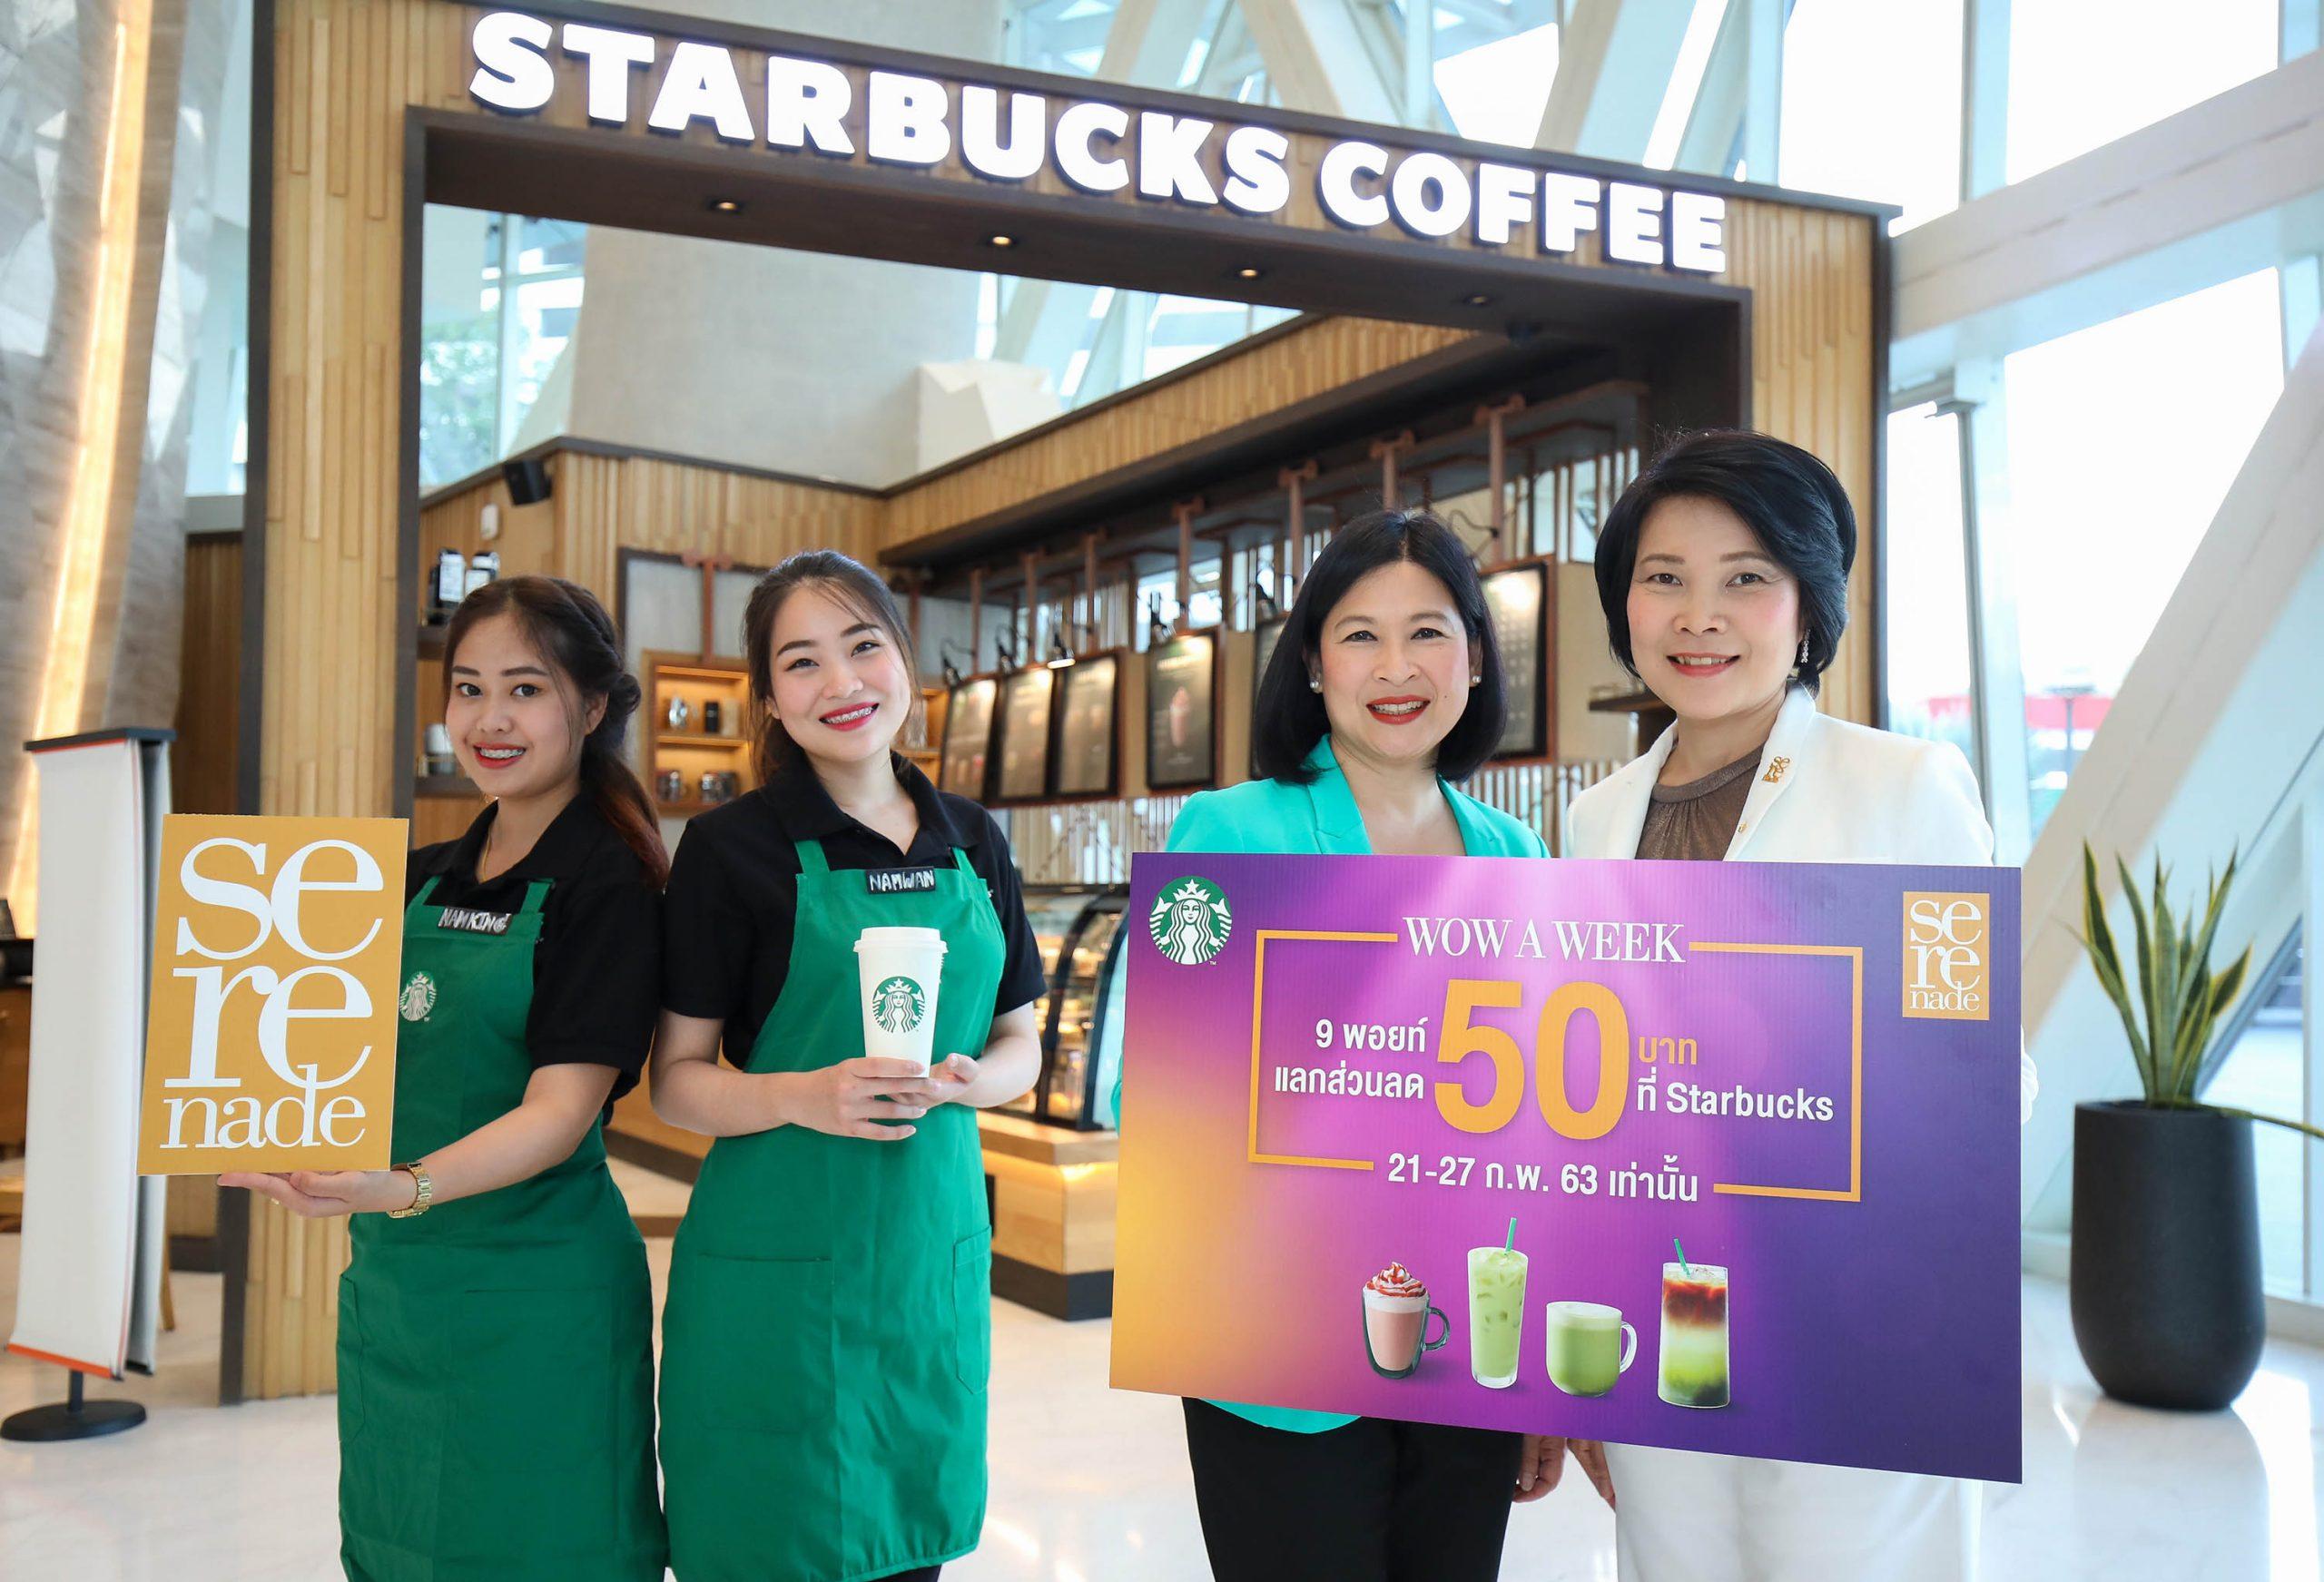 200221 Pic_01 AIS Serenade X Starbucks ใช้พอยท์แลกรับเครื่องดื่มยอดฮิต